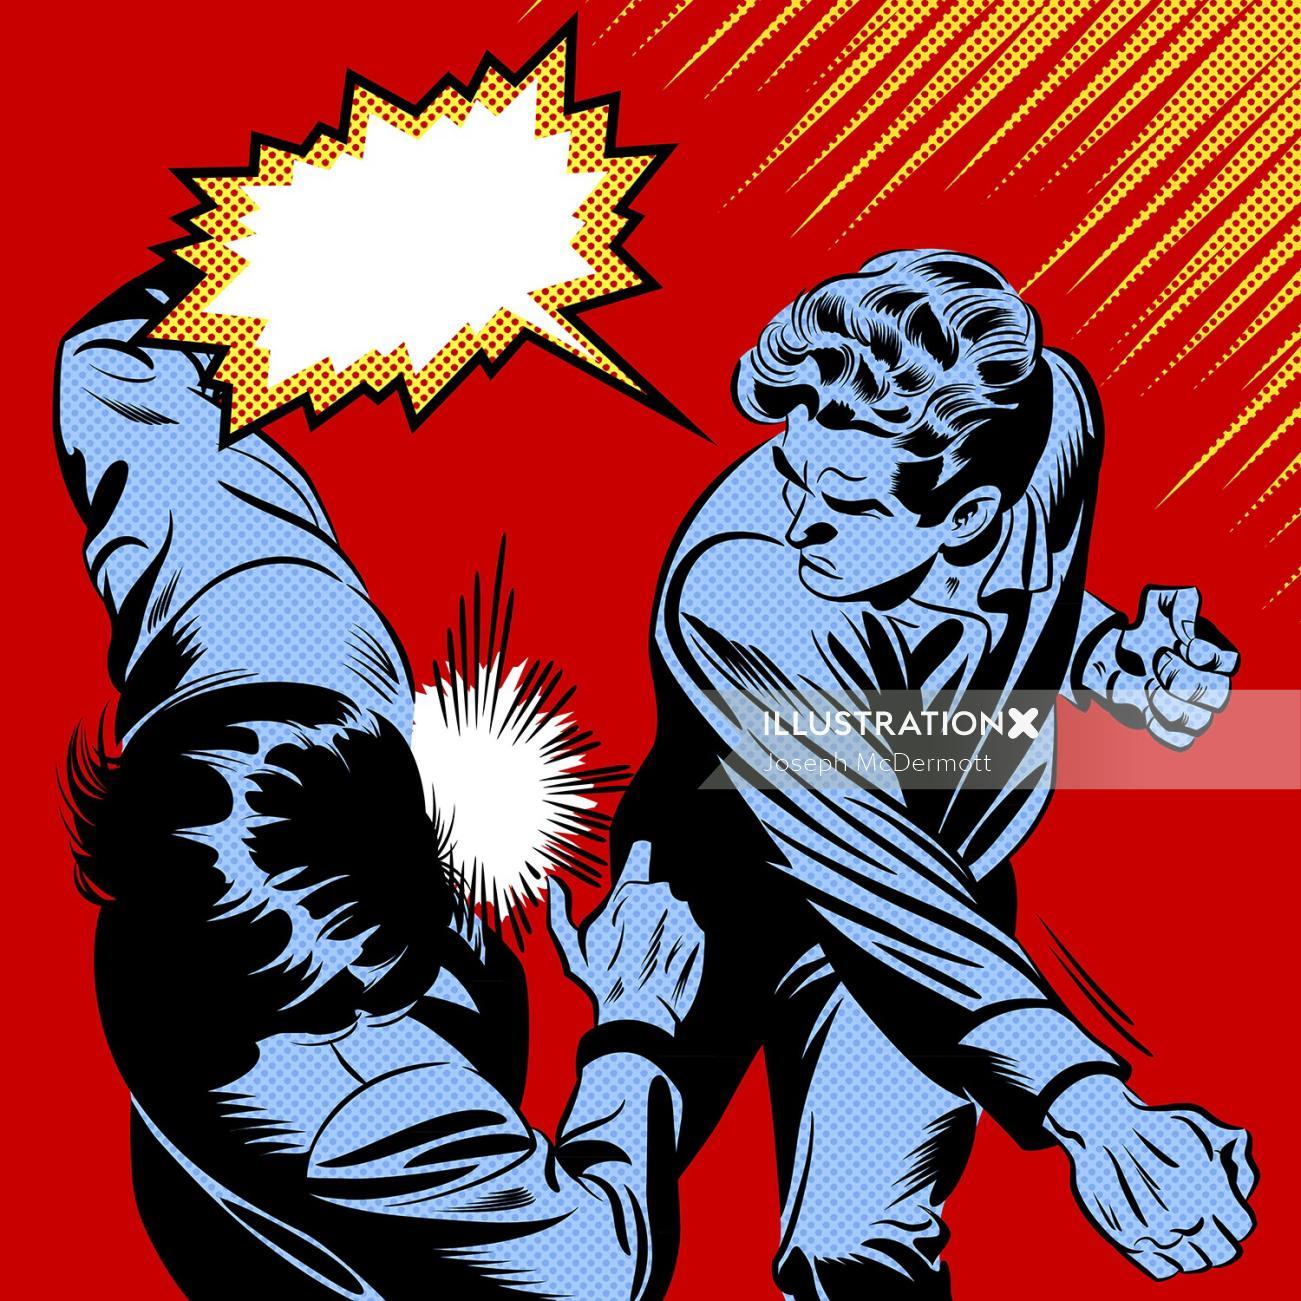 Pop art of people punching